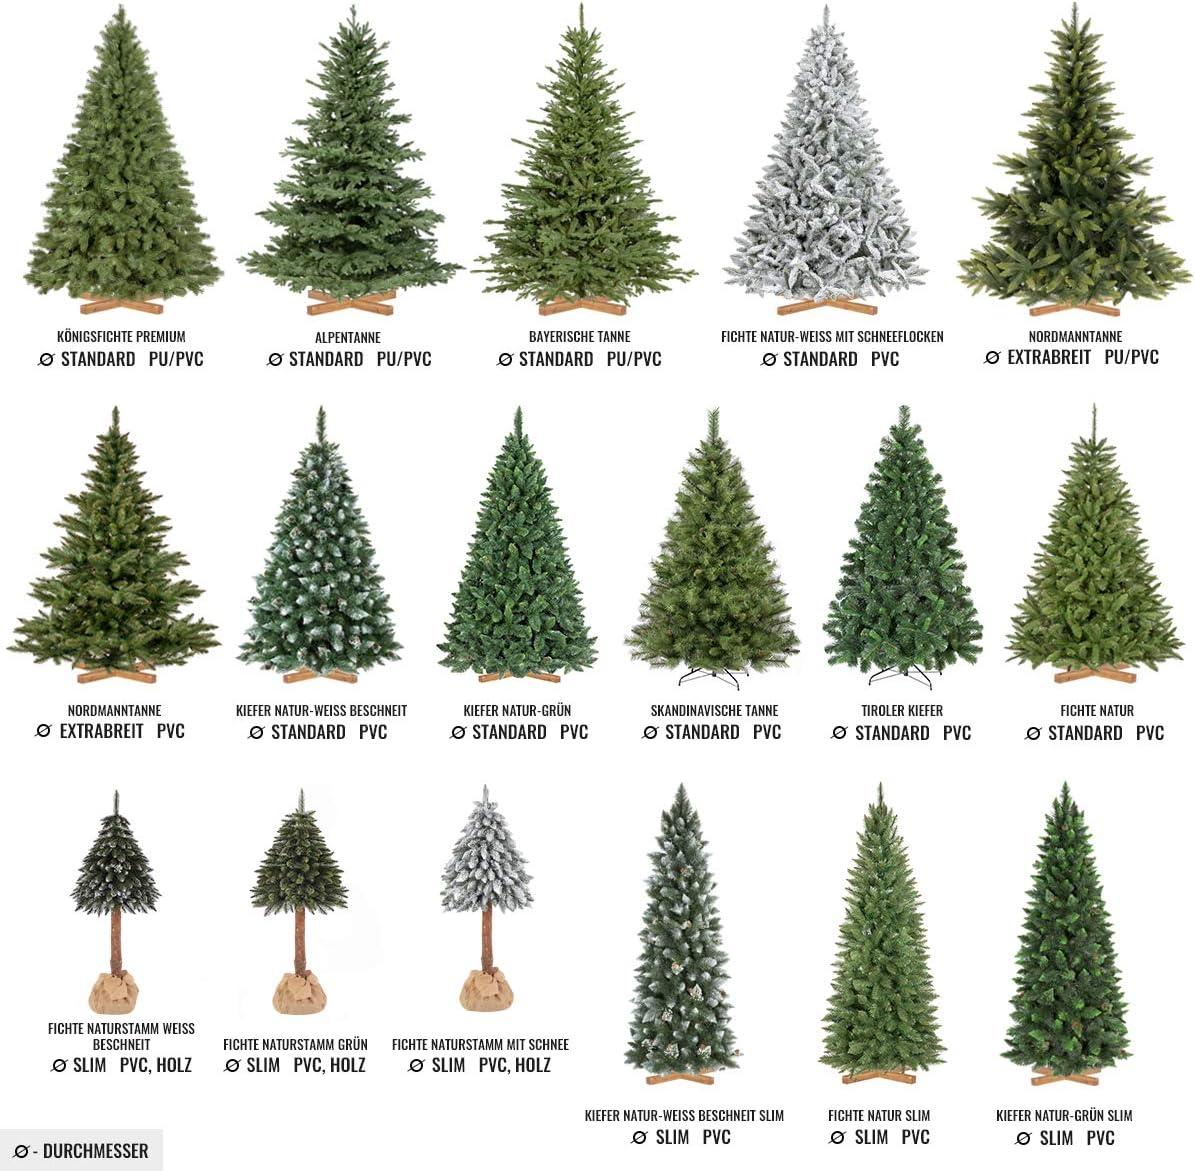 FairyTrees /Árbol de Navidad Artificial Pino 250cm pi/ñas verdaderas Material PVC FT04-250 Natural Blanco nevado Soporte de Madera